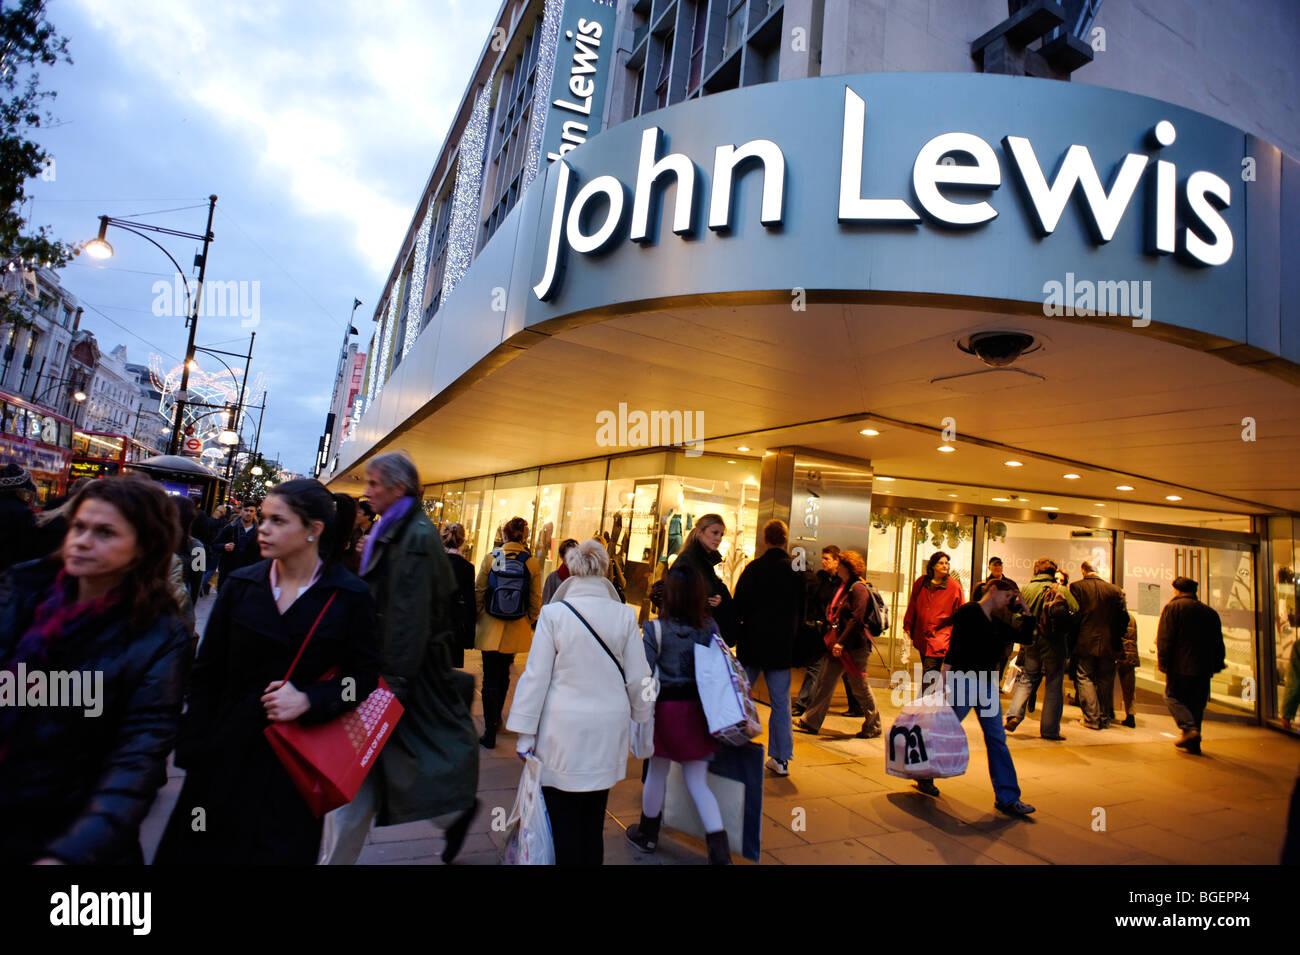 John Lewis department store on Oxford Street. London. UK 2009 - Stock Image